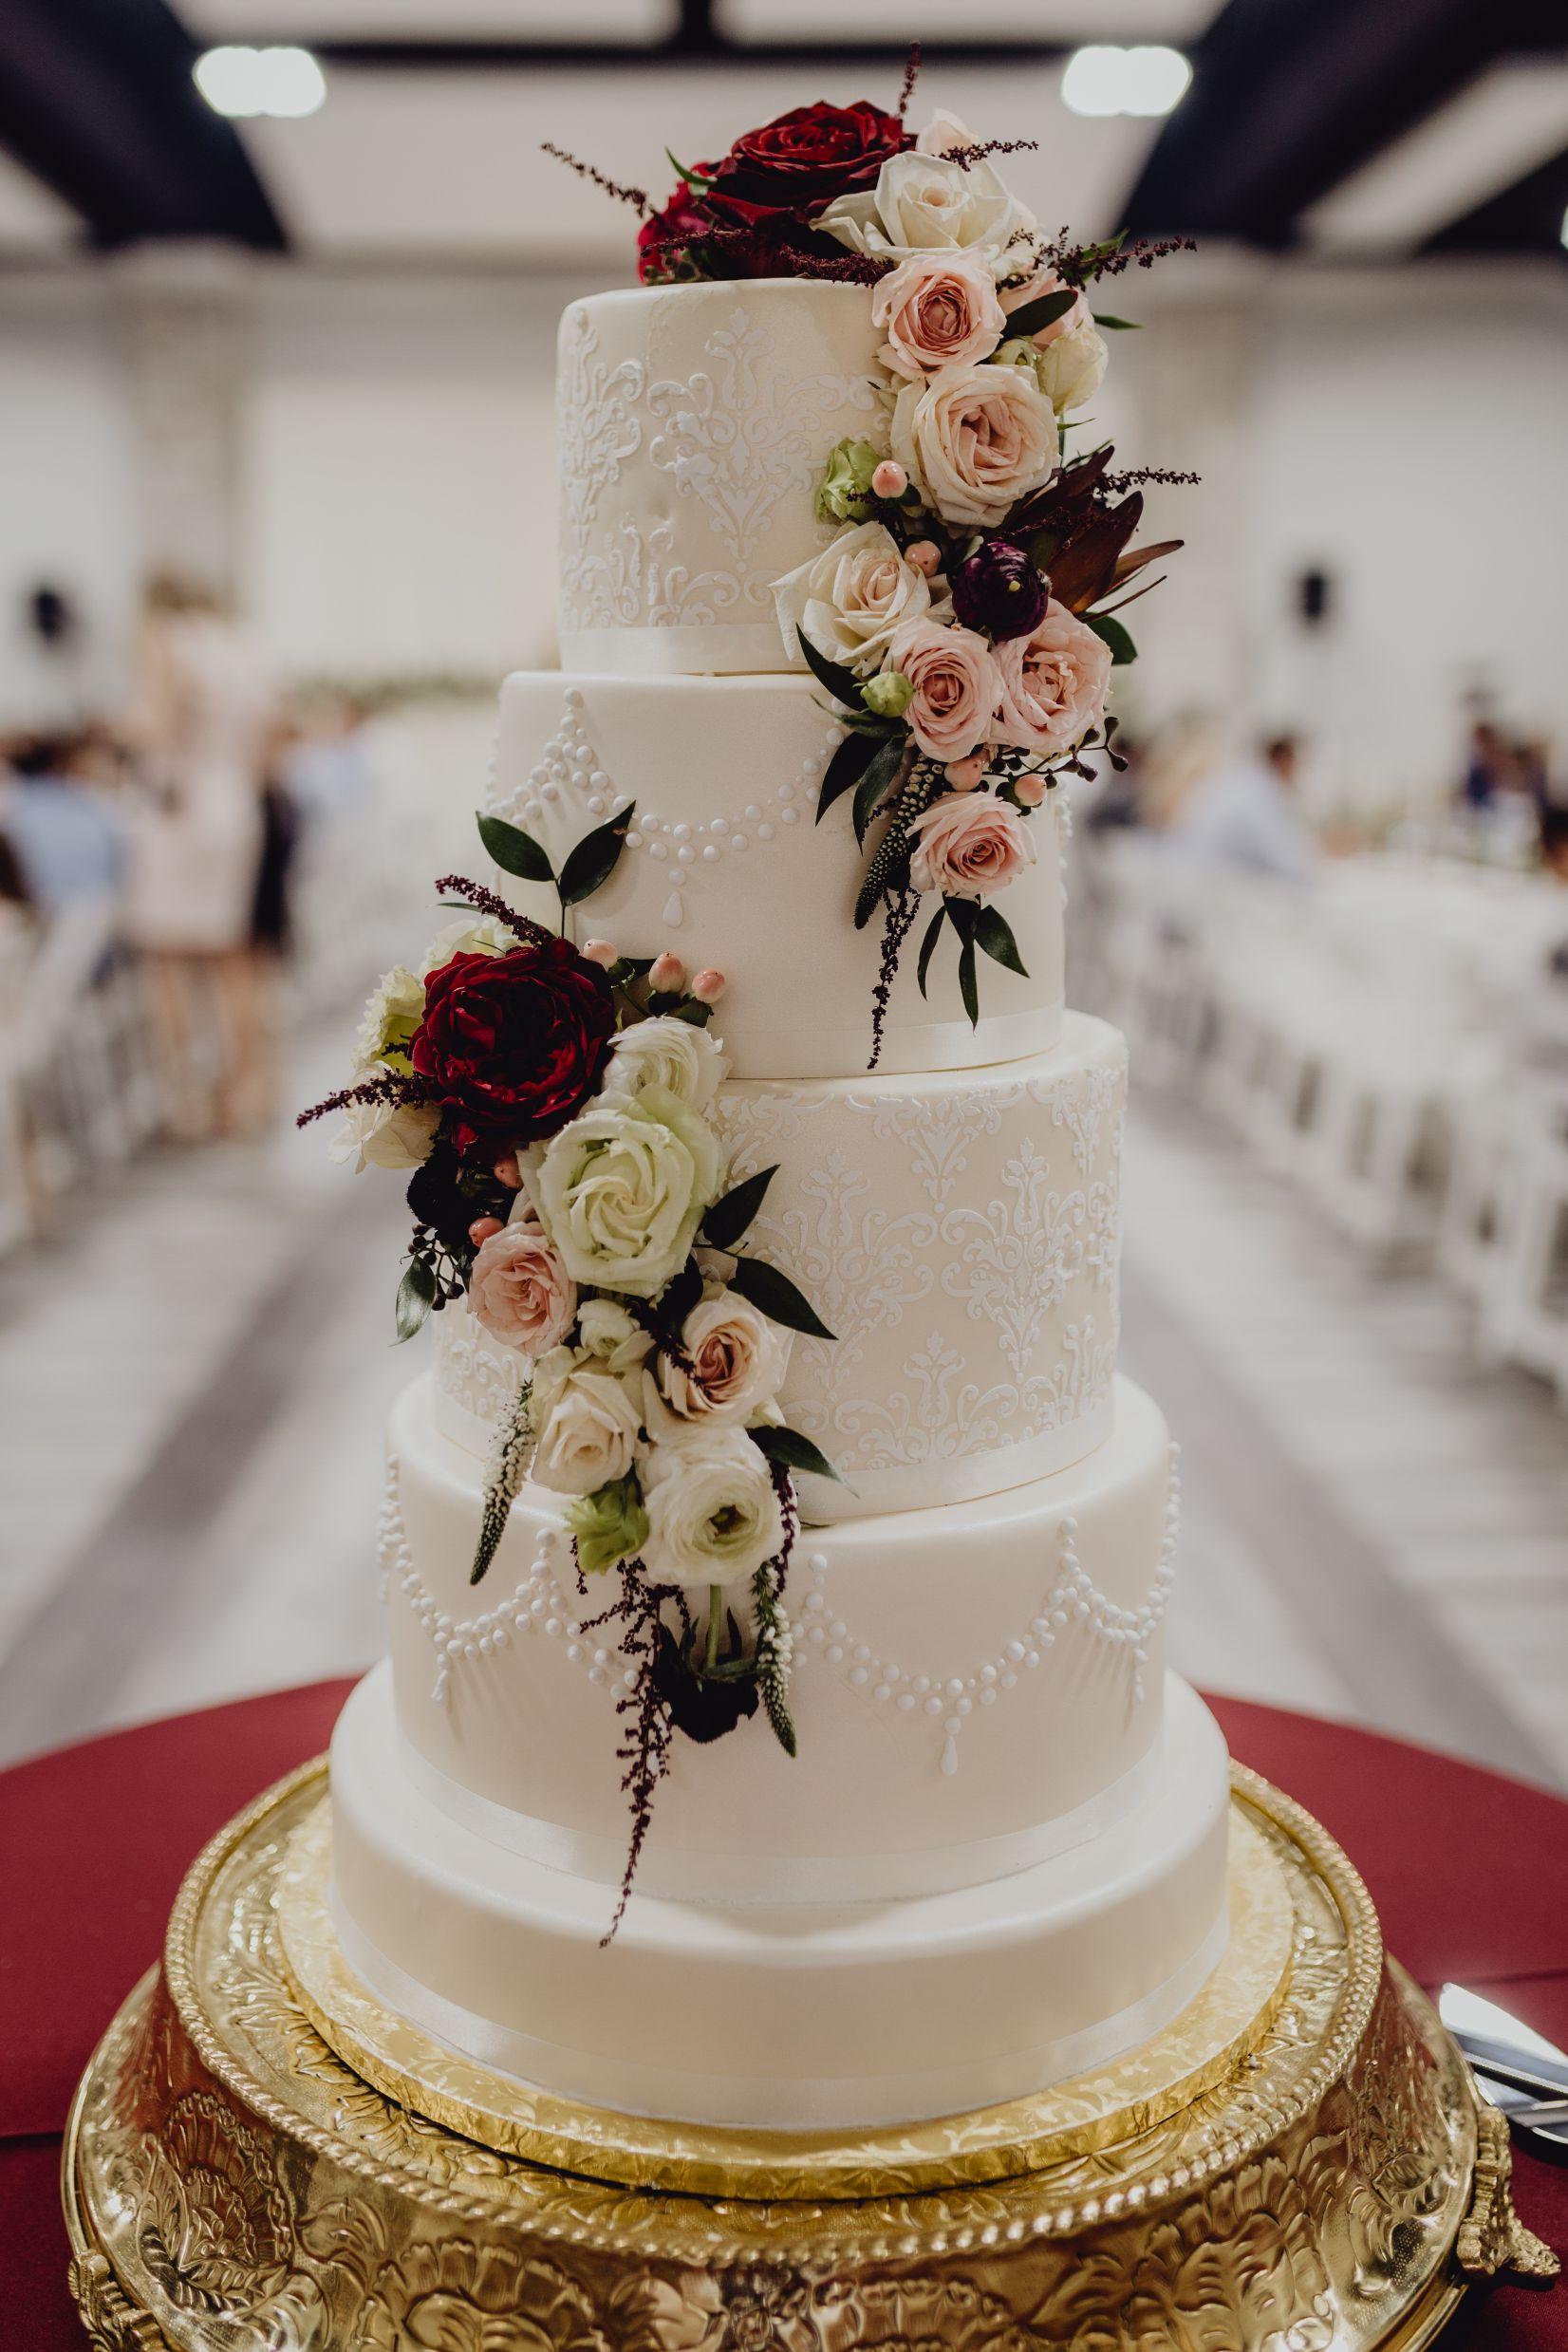 North-Dallas-Wedding-Florist-David-Co.-13.jpg